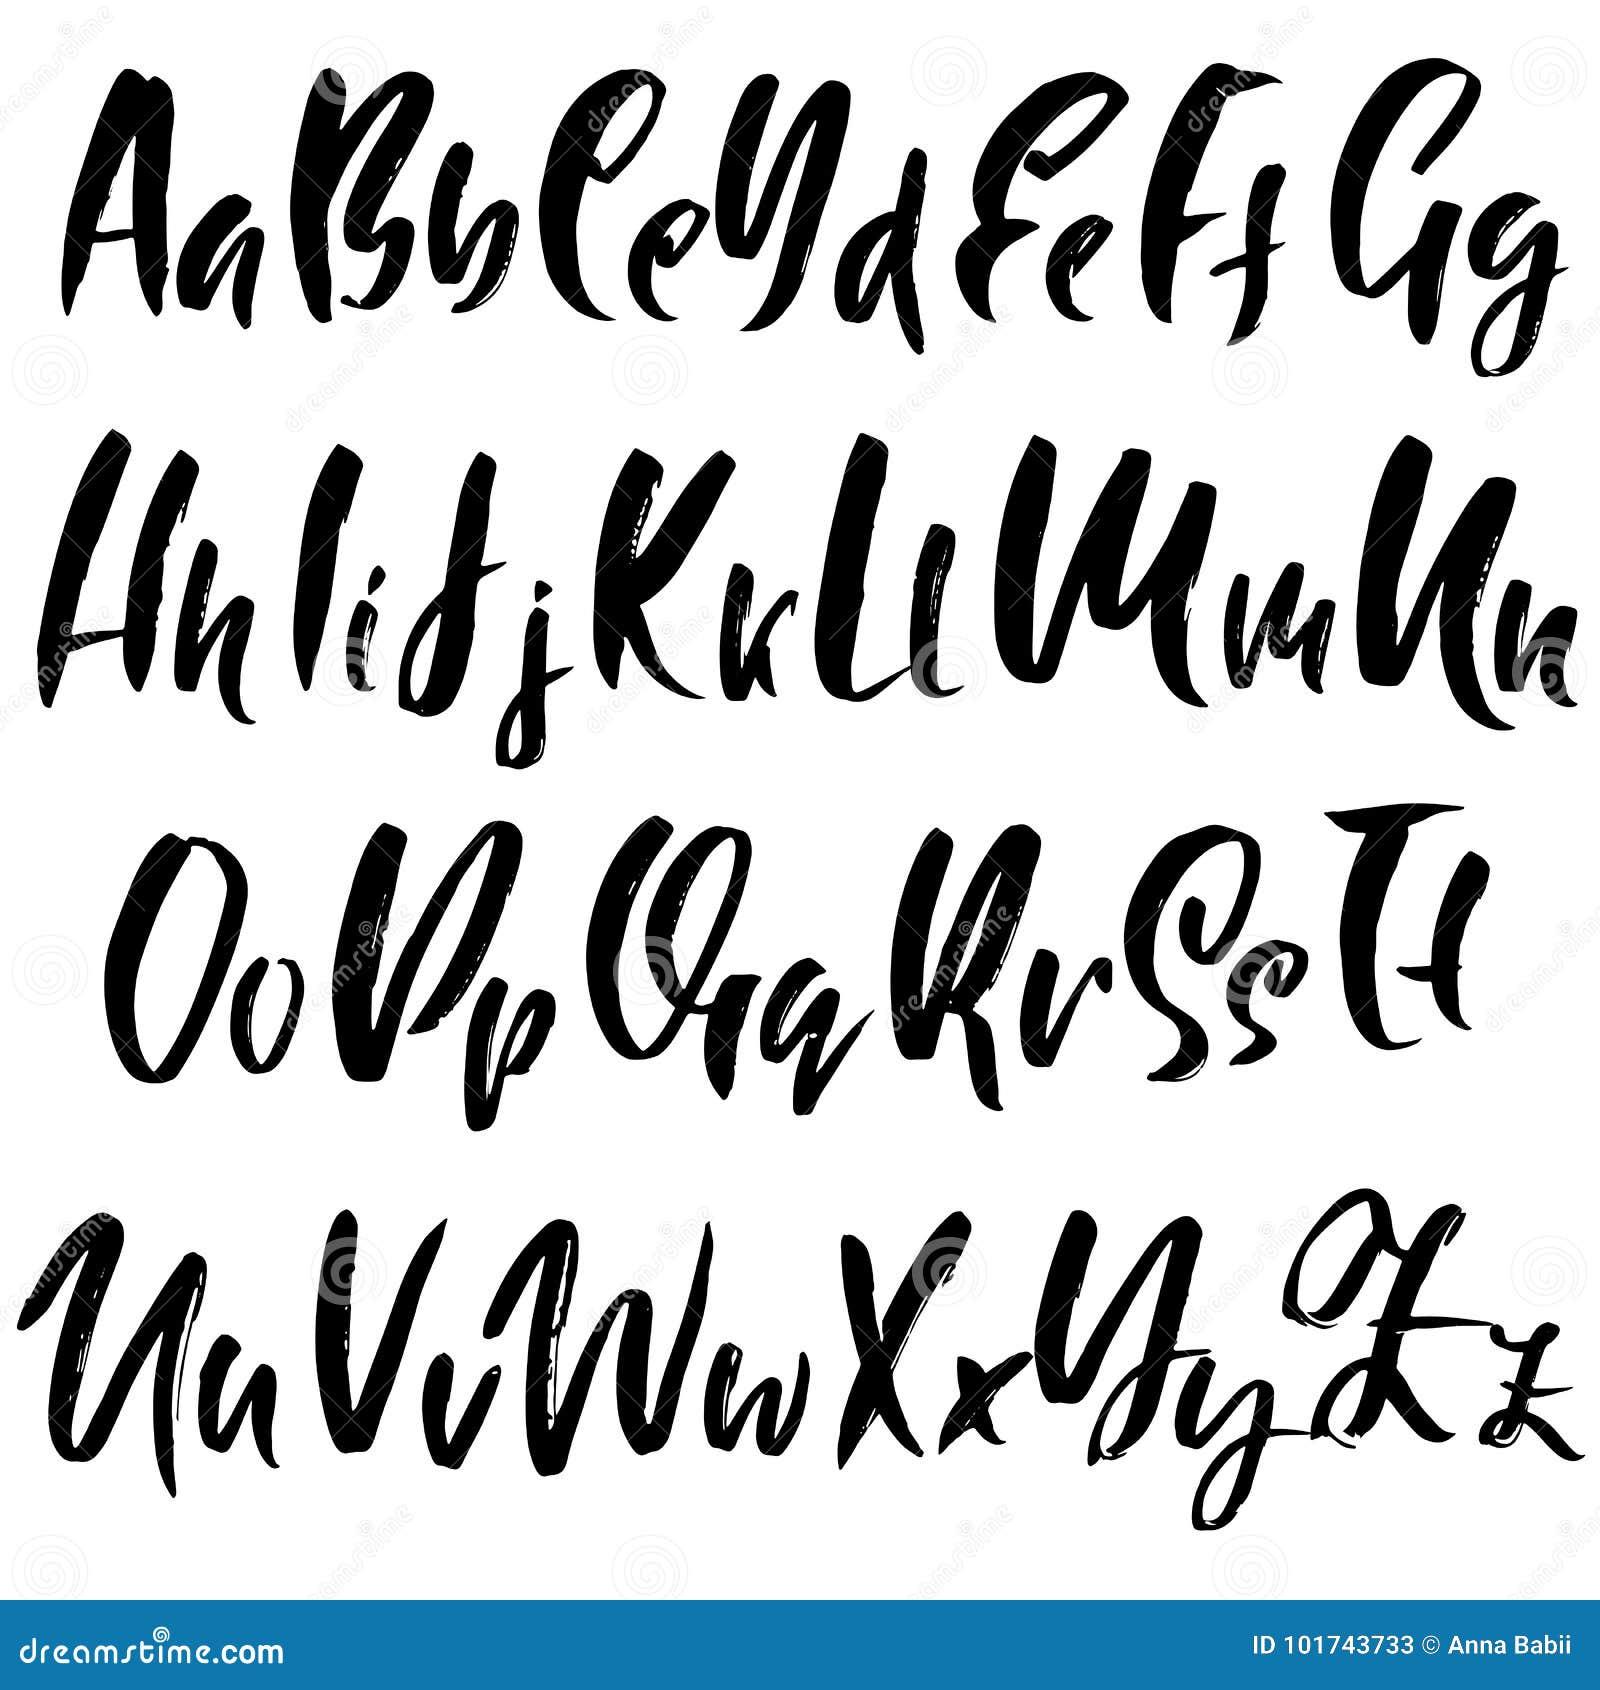 Hand Drawn Dry Brush Font Modern Lettering Grunge Style Alphabet Calligraphy Script Vector Illustration